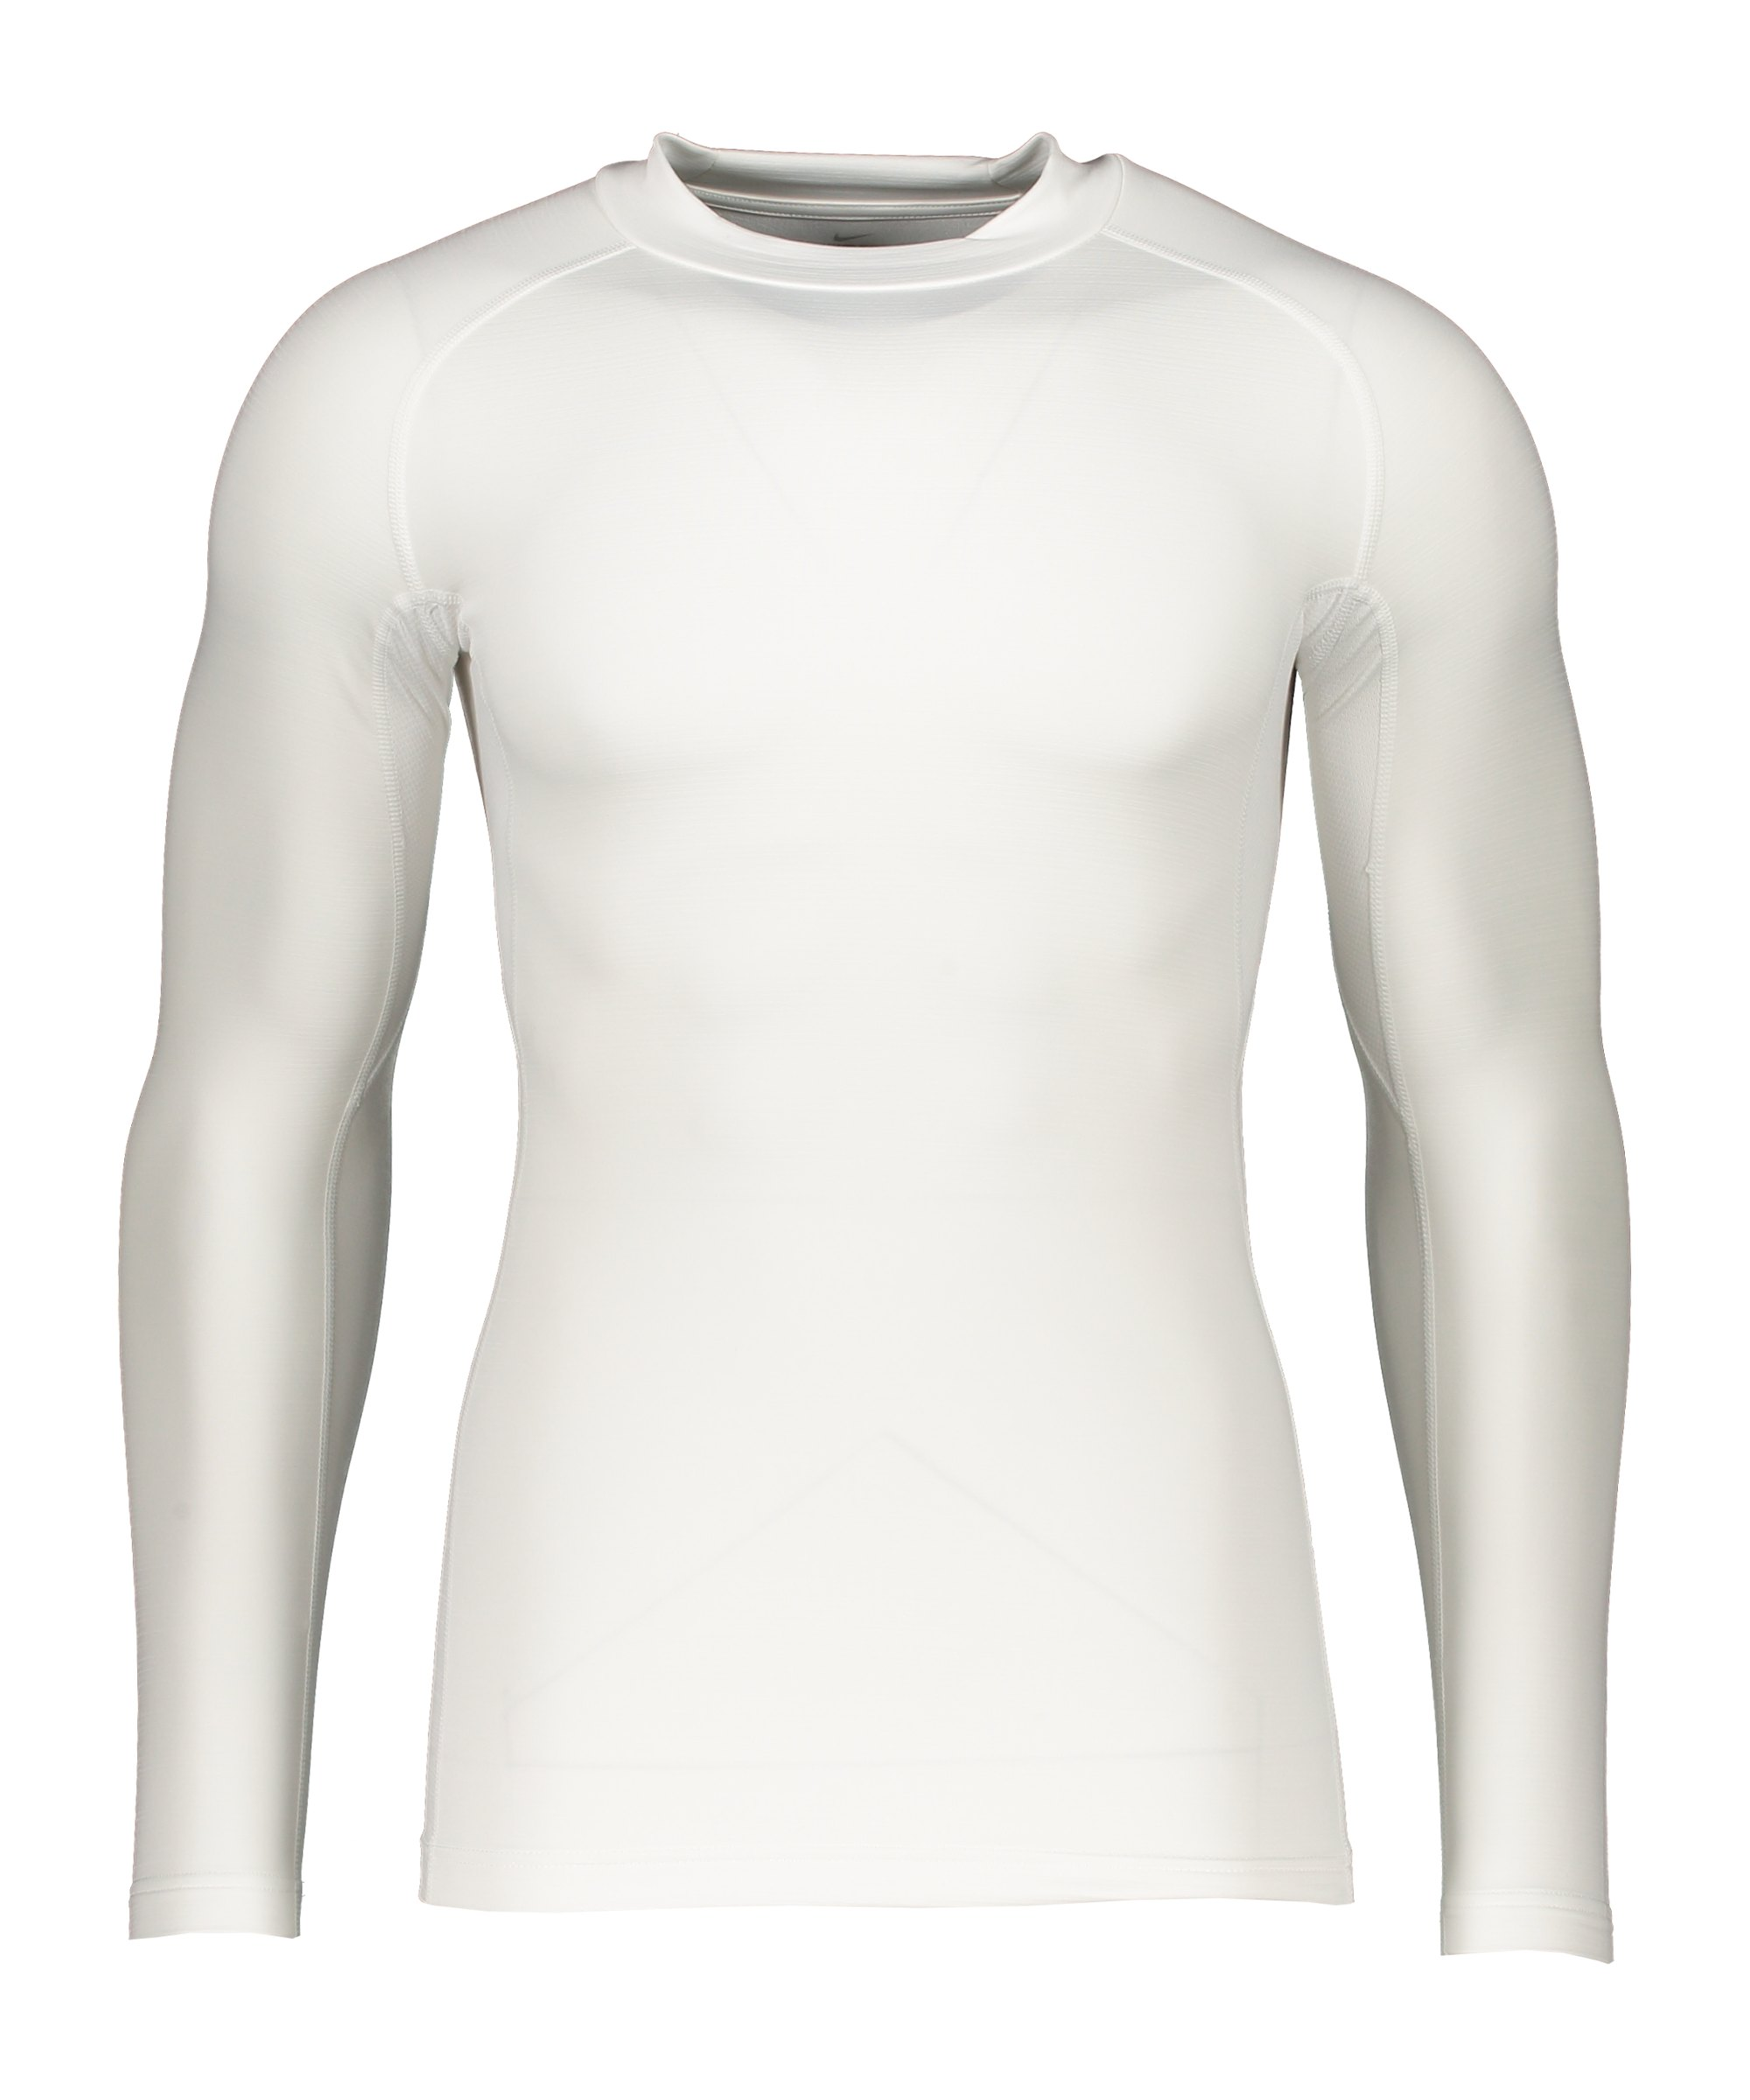 Nike NP Hyperwarm Max Comp Mock Sweatshirt F100 - weiss